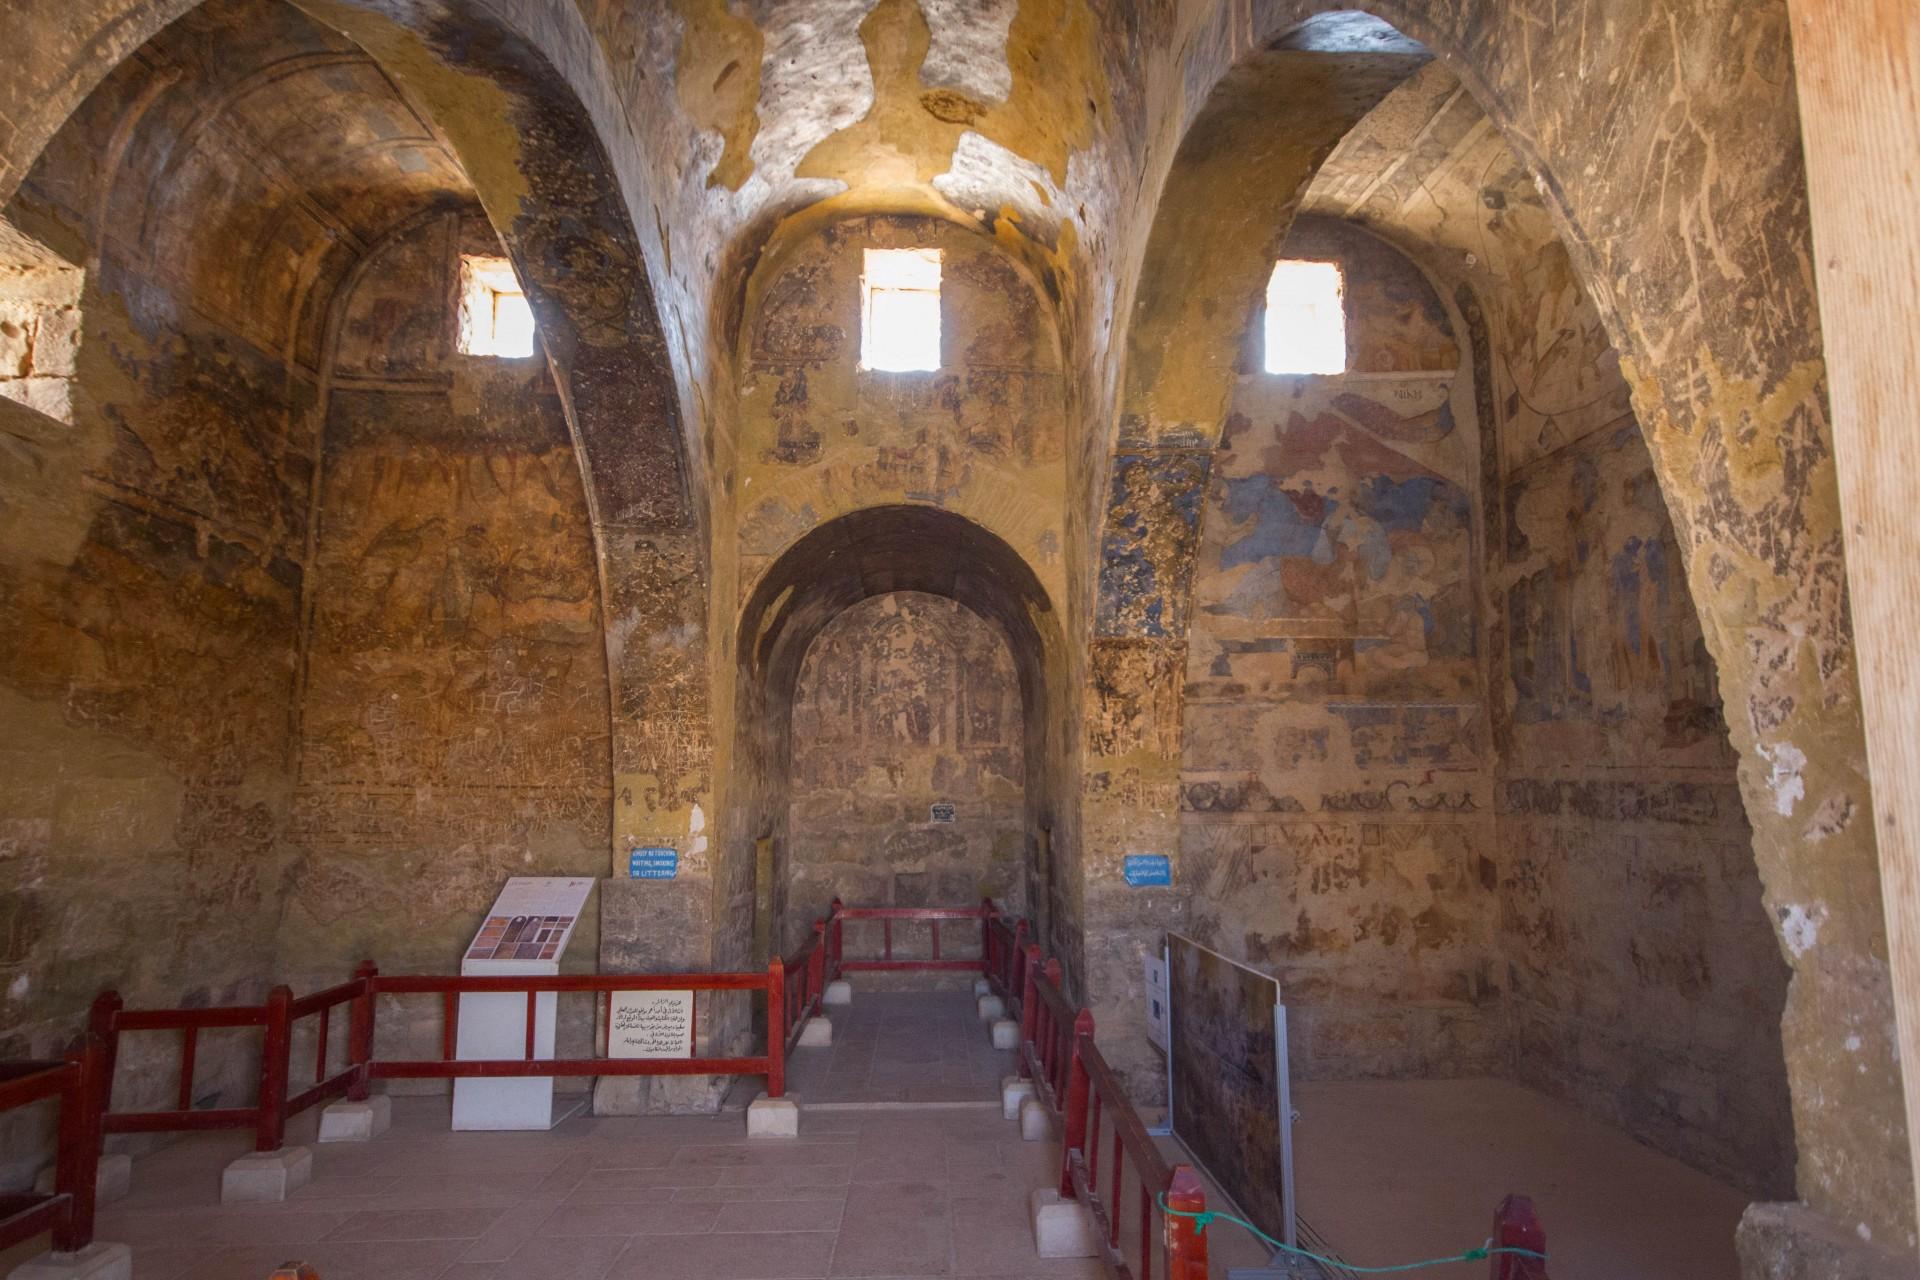 Qusayr Amra - Frescoes